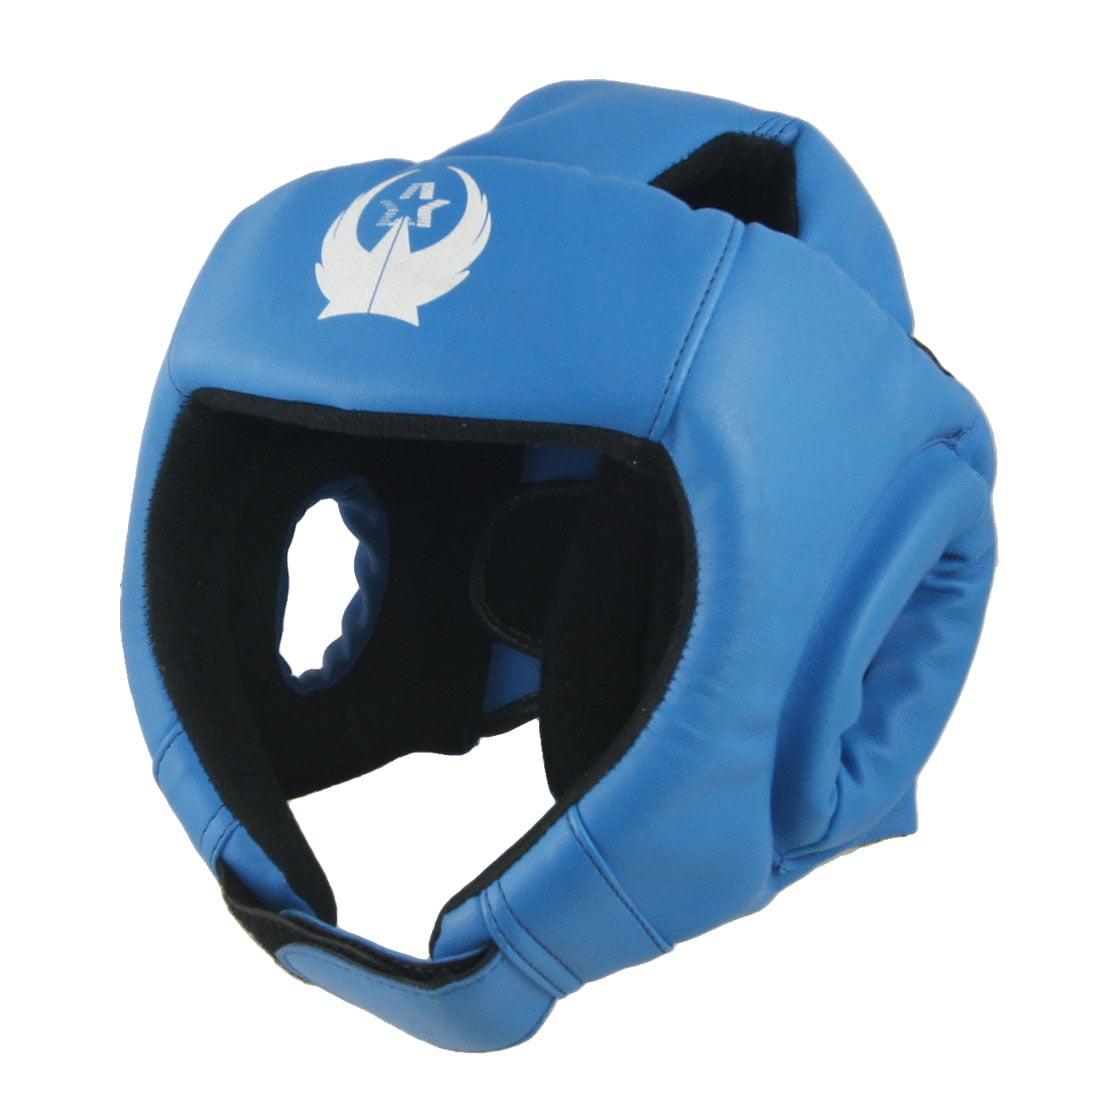 Adjustable Sponge Padded Guard Adult Boxing Headgear Helmet Size S